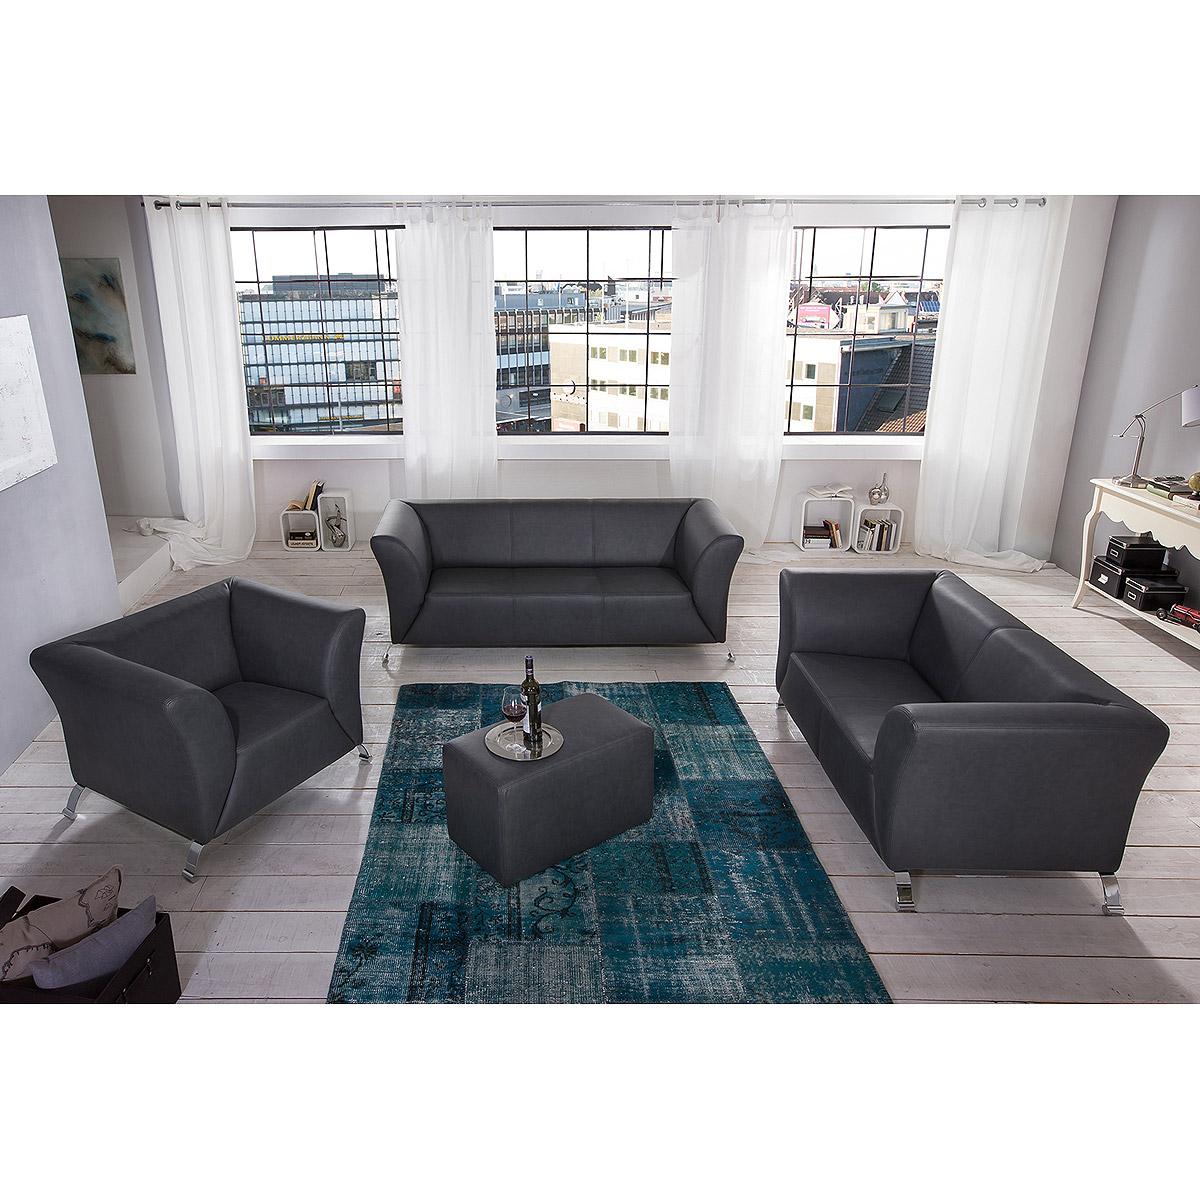 sofagarnitur torino garnitur sofa 3 2 1 polsterm bel in. Black Bedroom Furniture Sets. Home Design Ideas